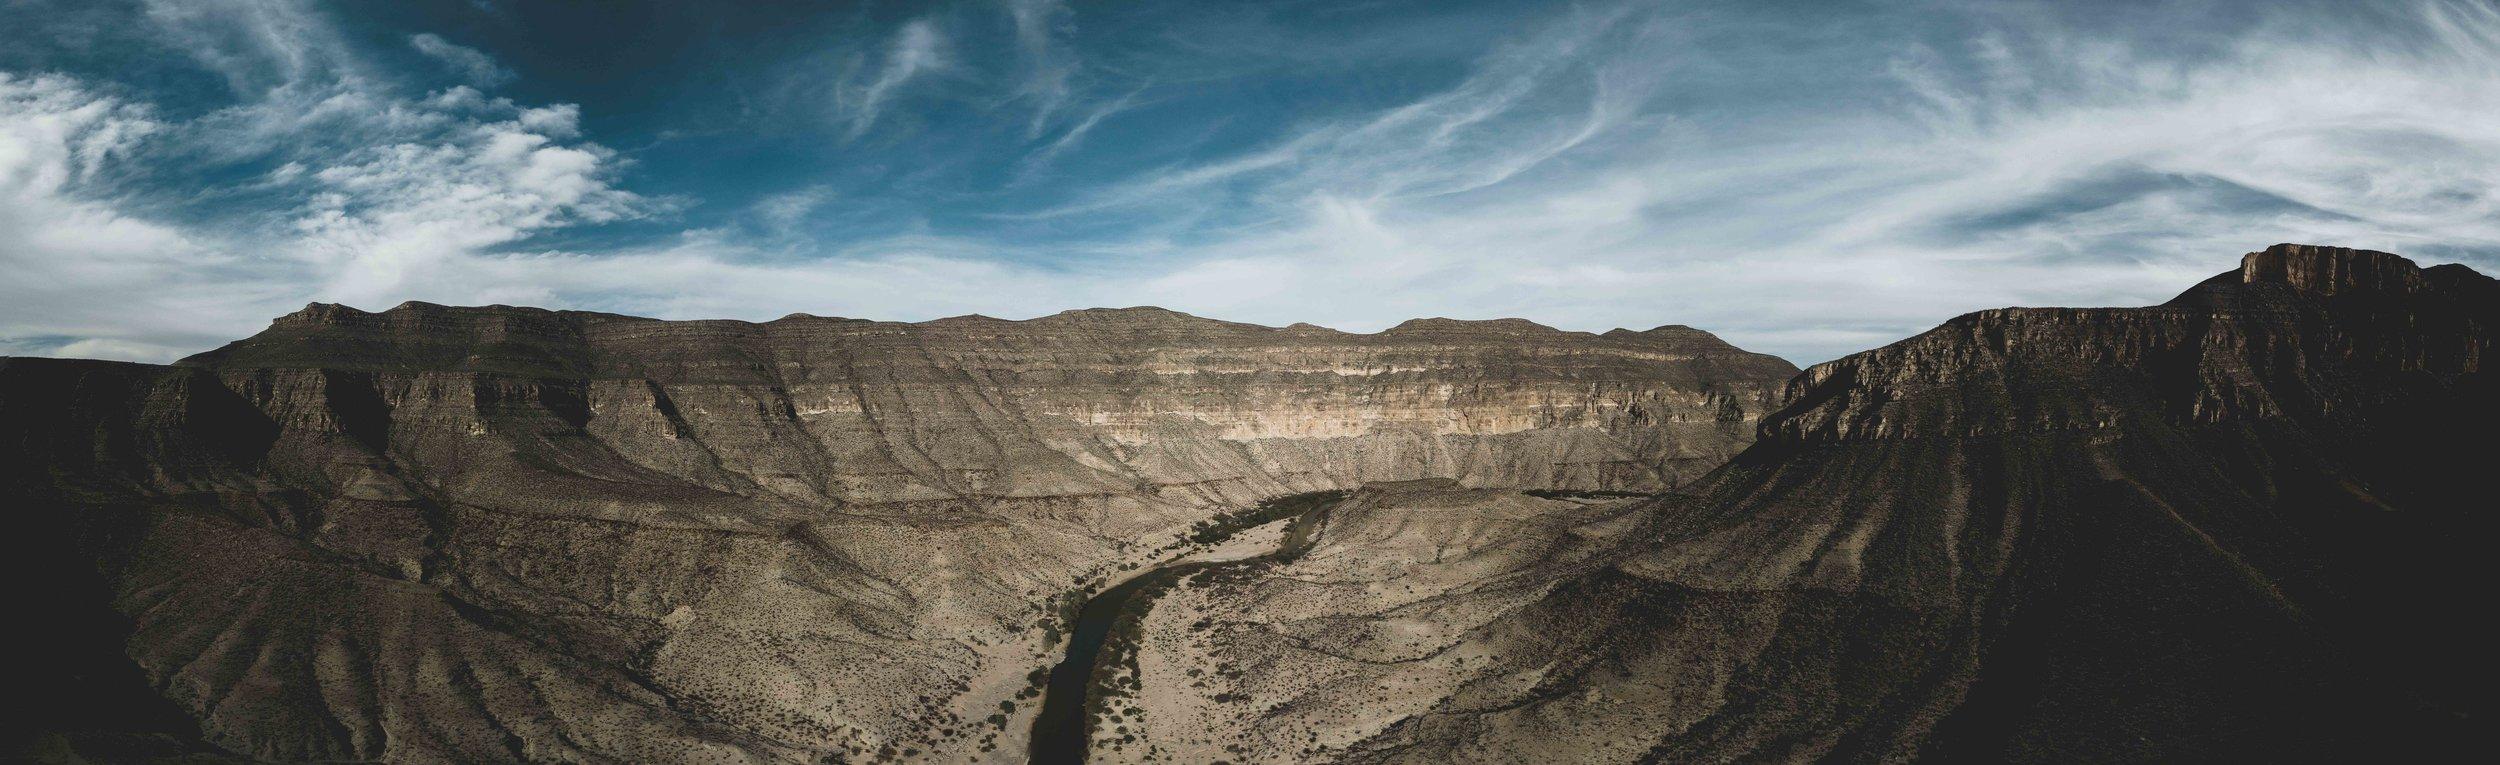 Reagan+Canyon+(92).jpg